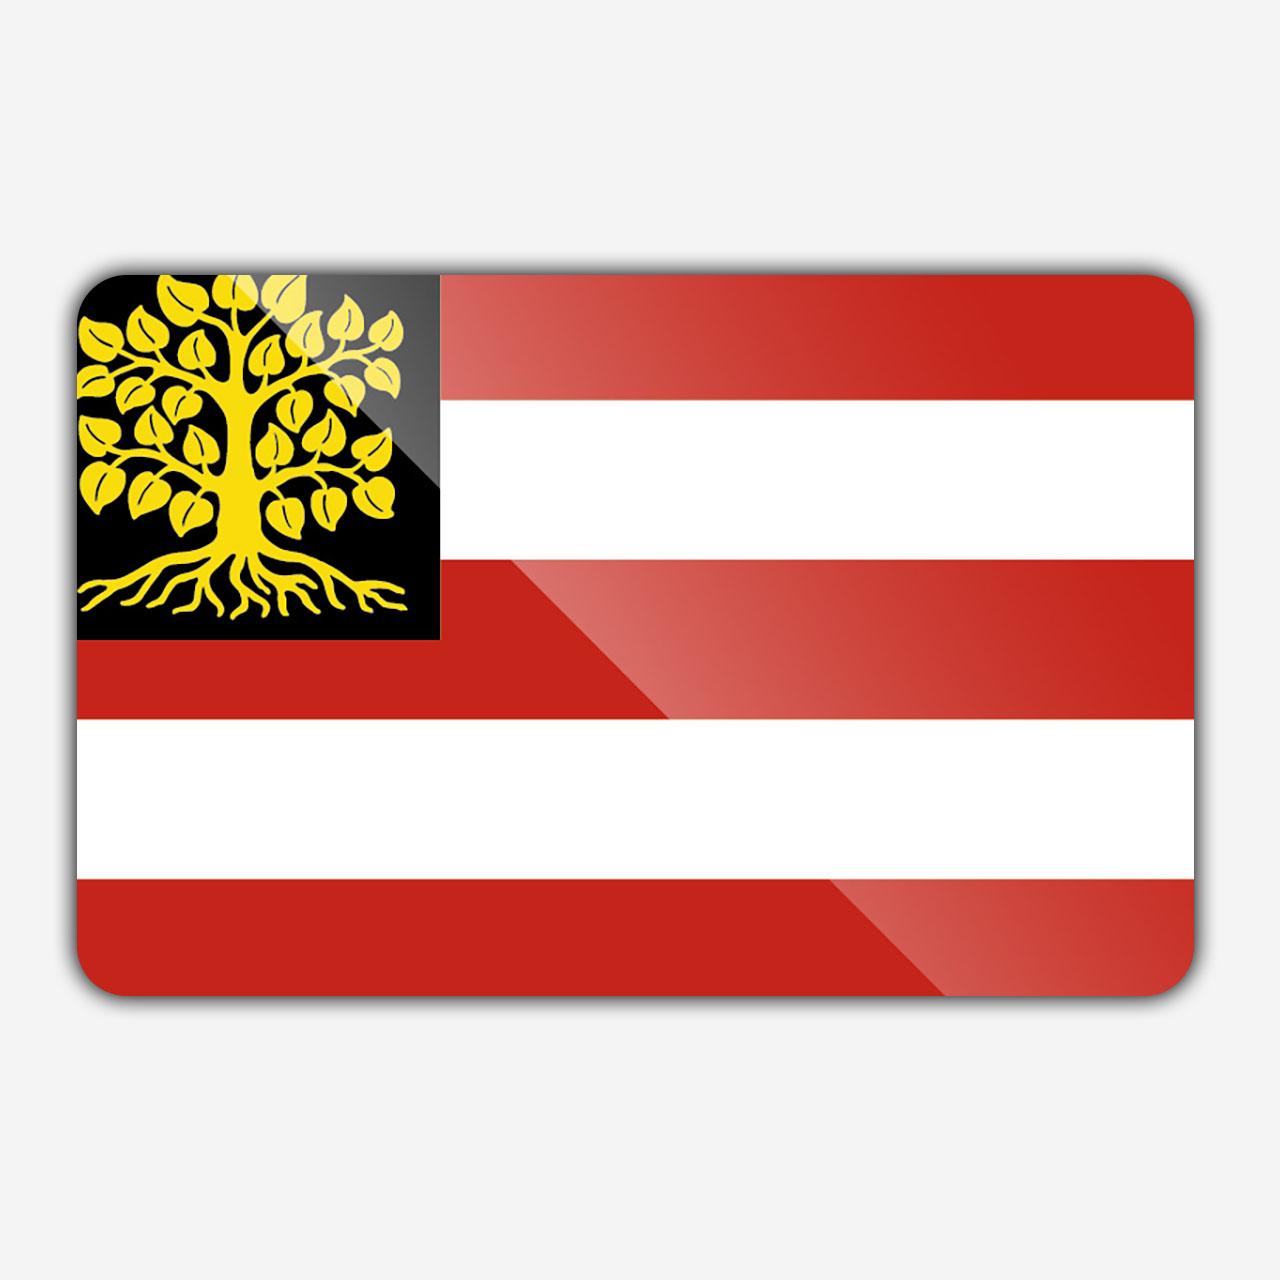 Vlag gemeente 's Hertogenbosch